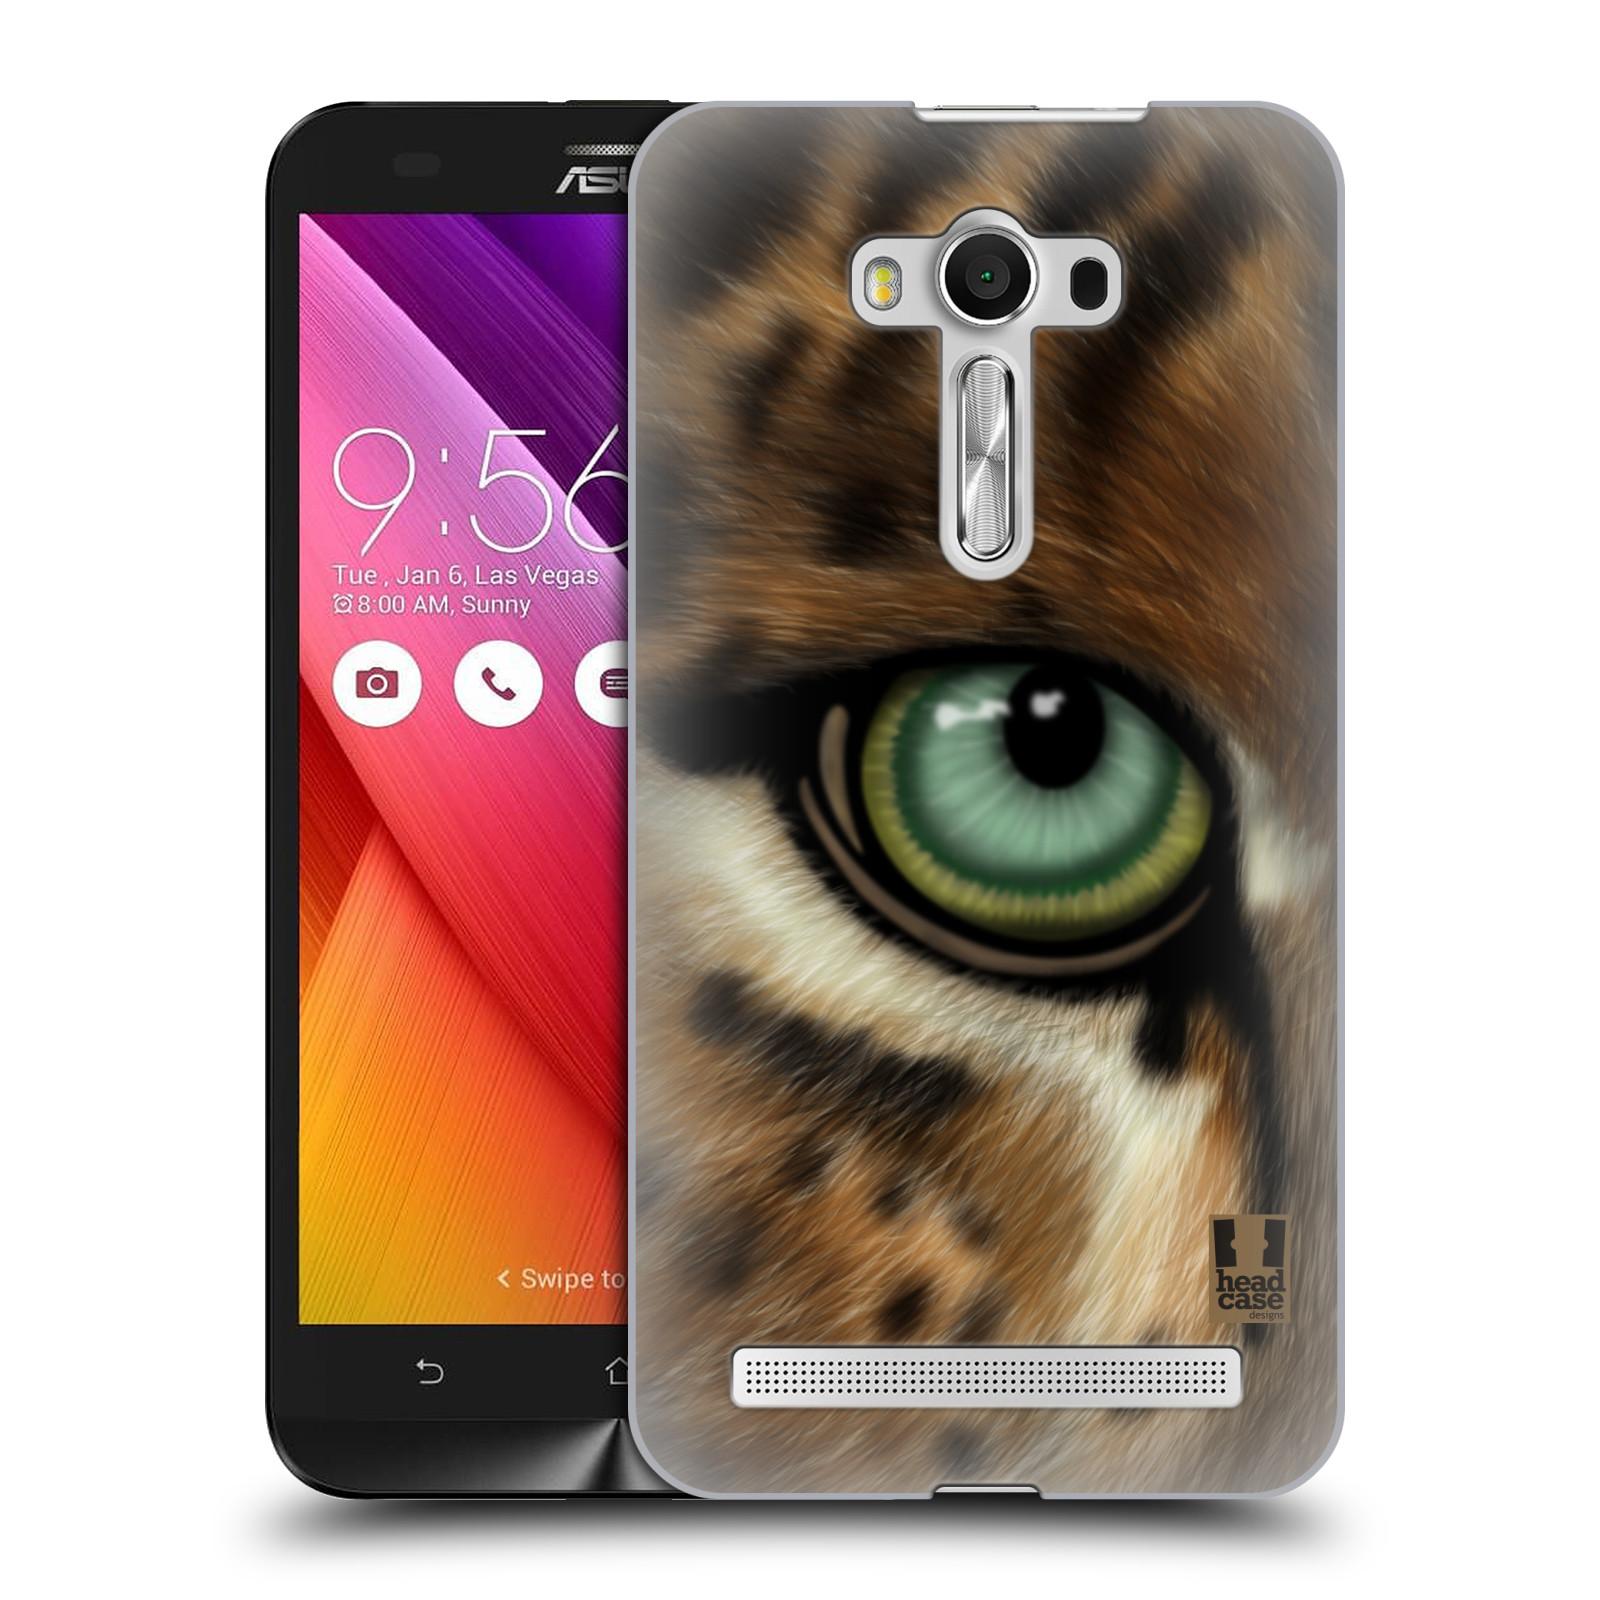 HEAD CASE plastový obal na mobil Asus Zenfone 2 LASER (5,5 displej ZE550KL) vzor pohled zvířete oko leopard